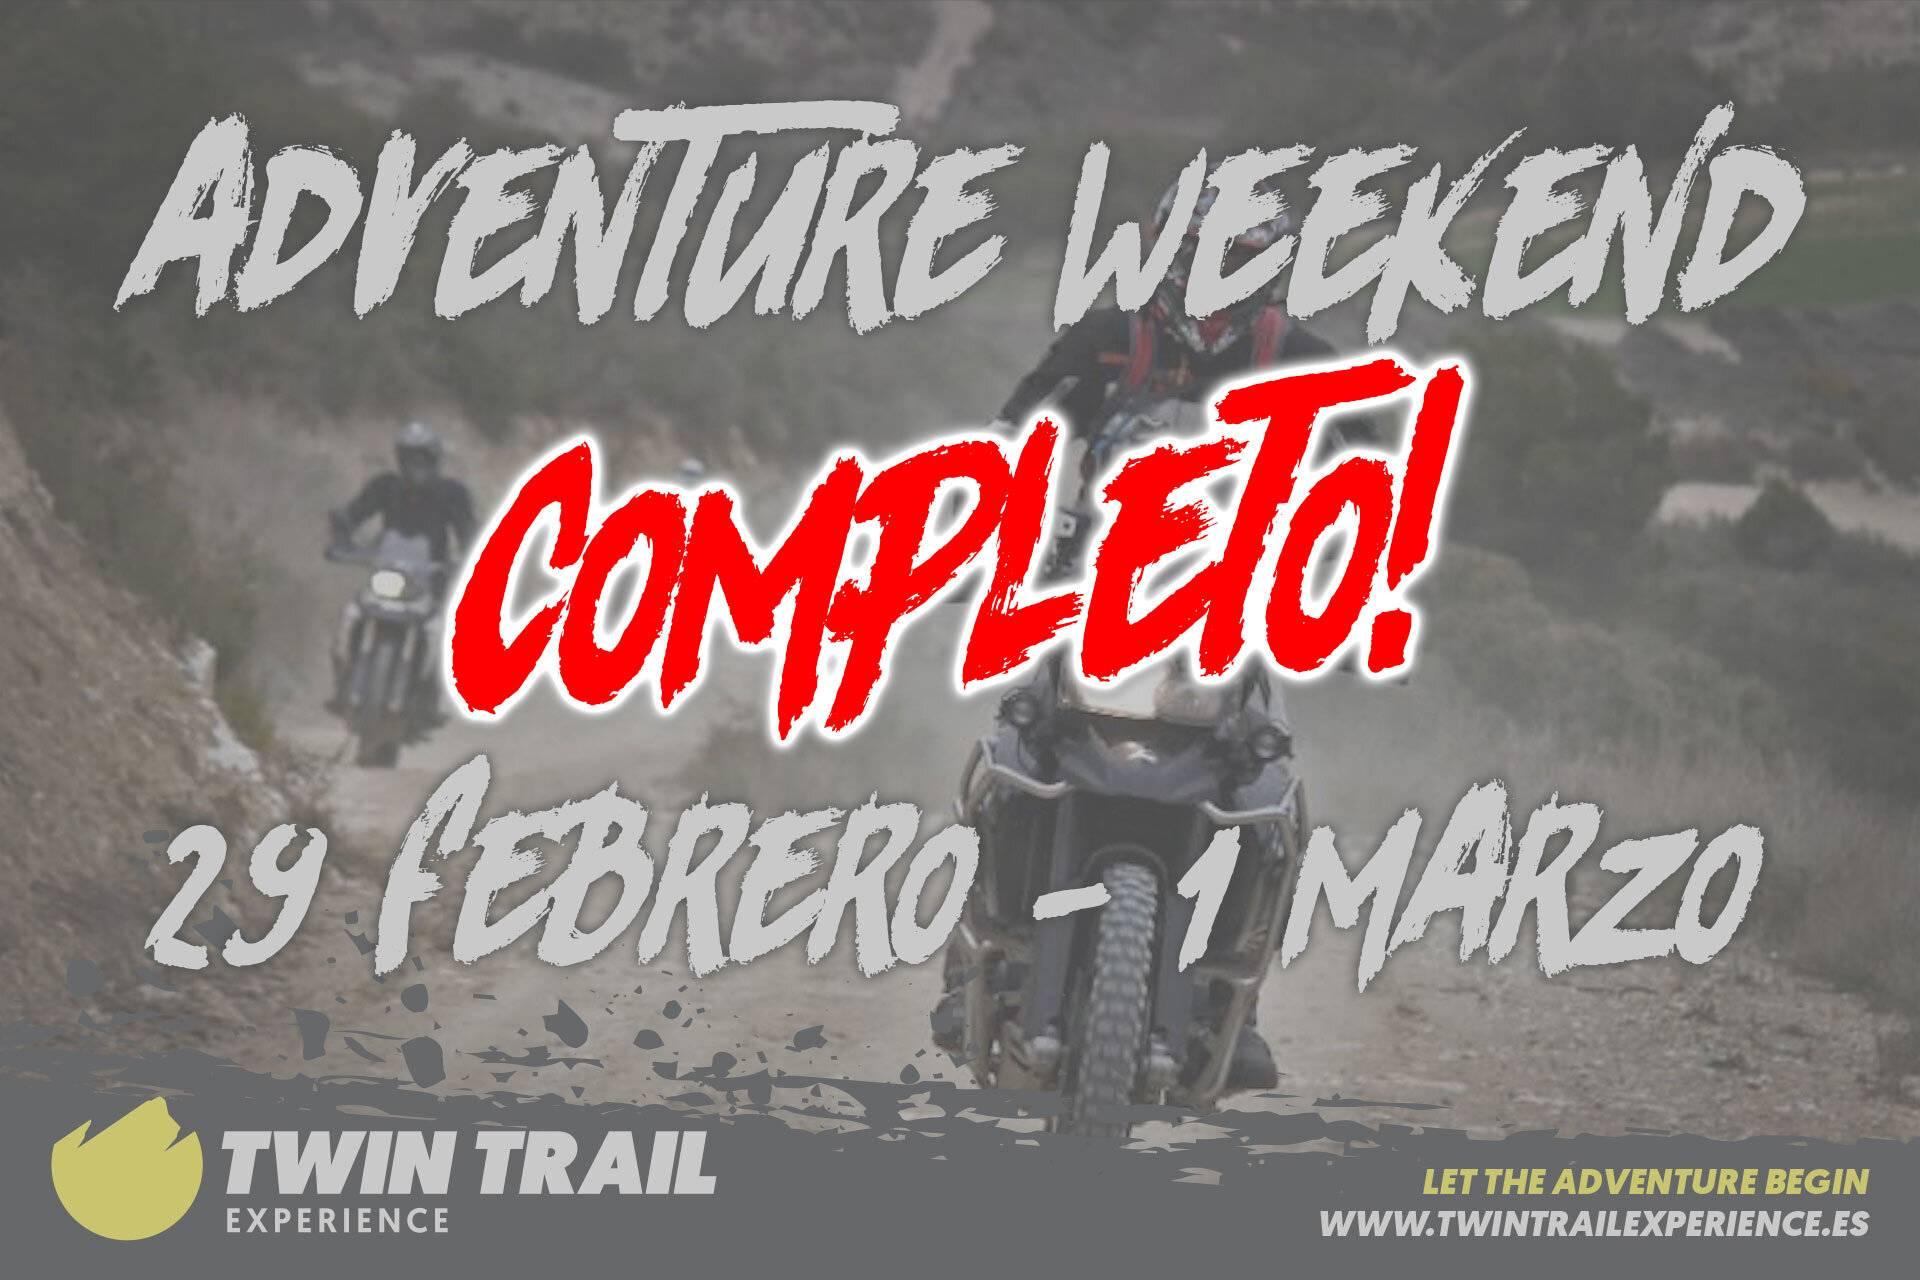 TwinTrail Adventure Weekend Monegros 2020